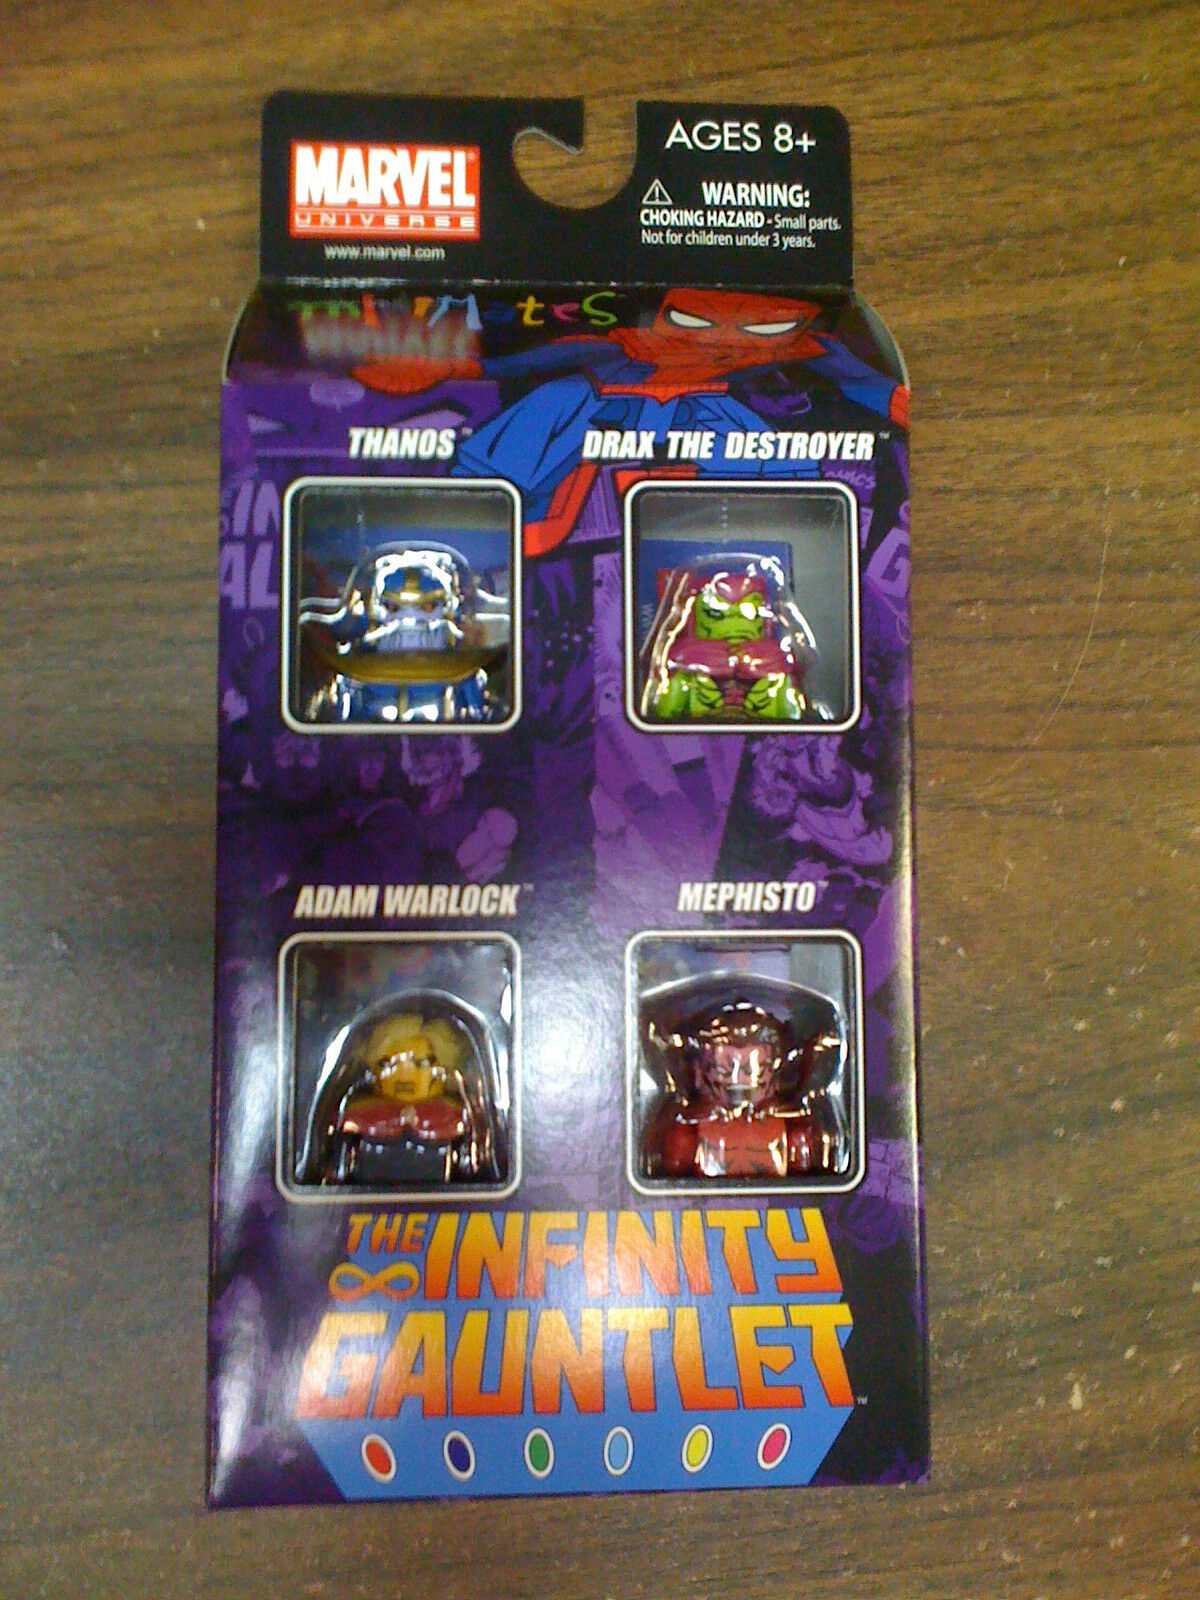 MARVEL Marvel Universe Infinity Gauntlet Minimates 4 Fig Set NEW